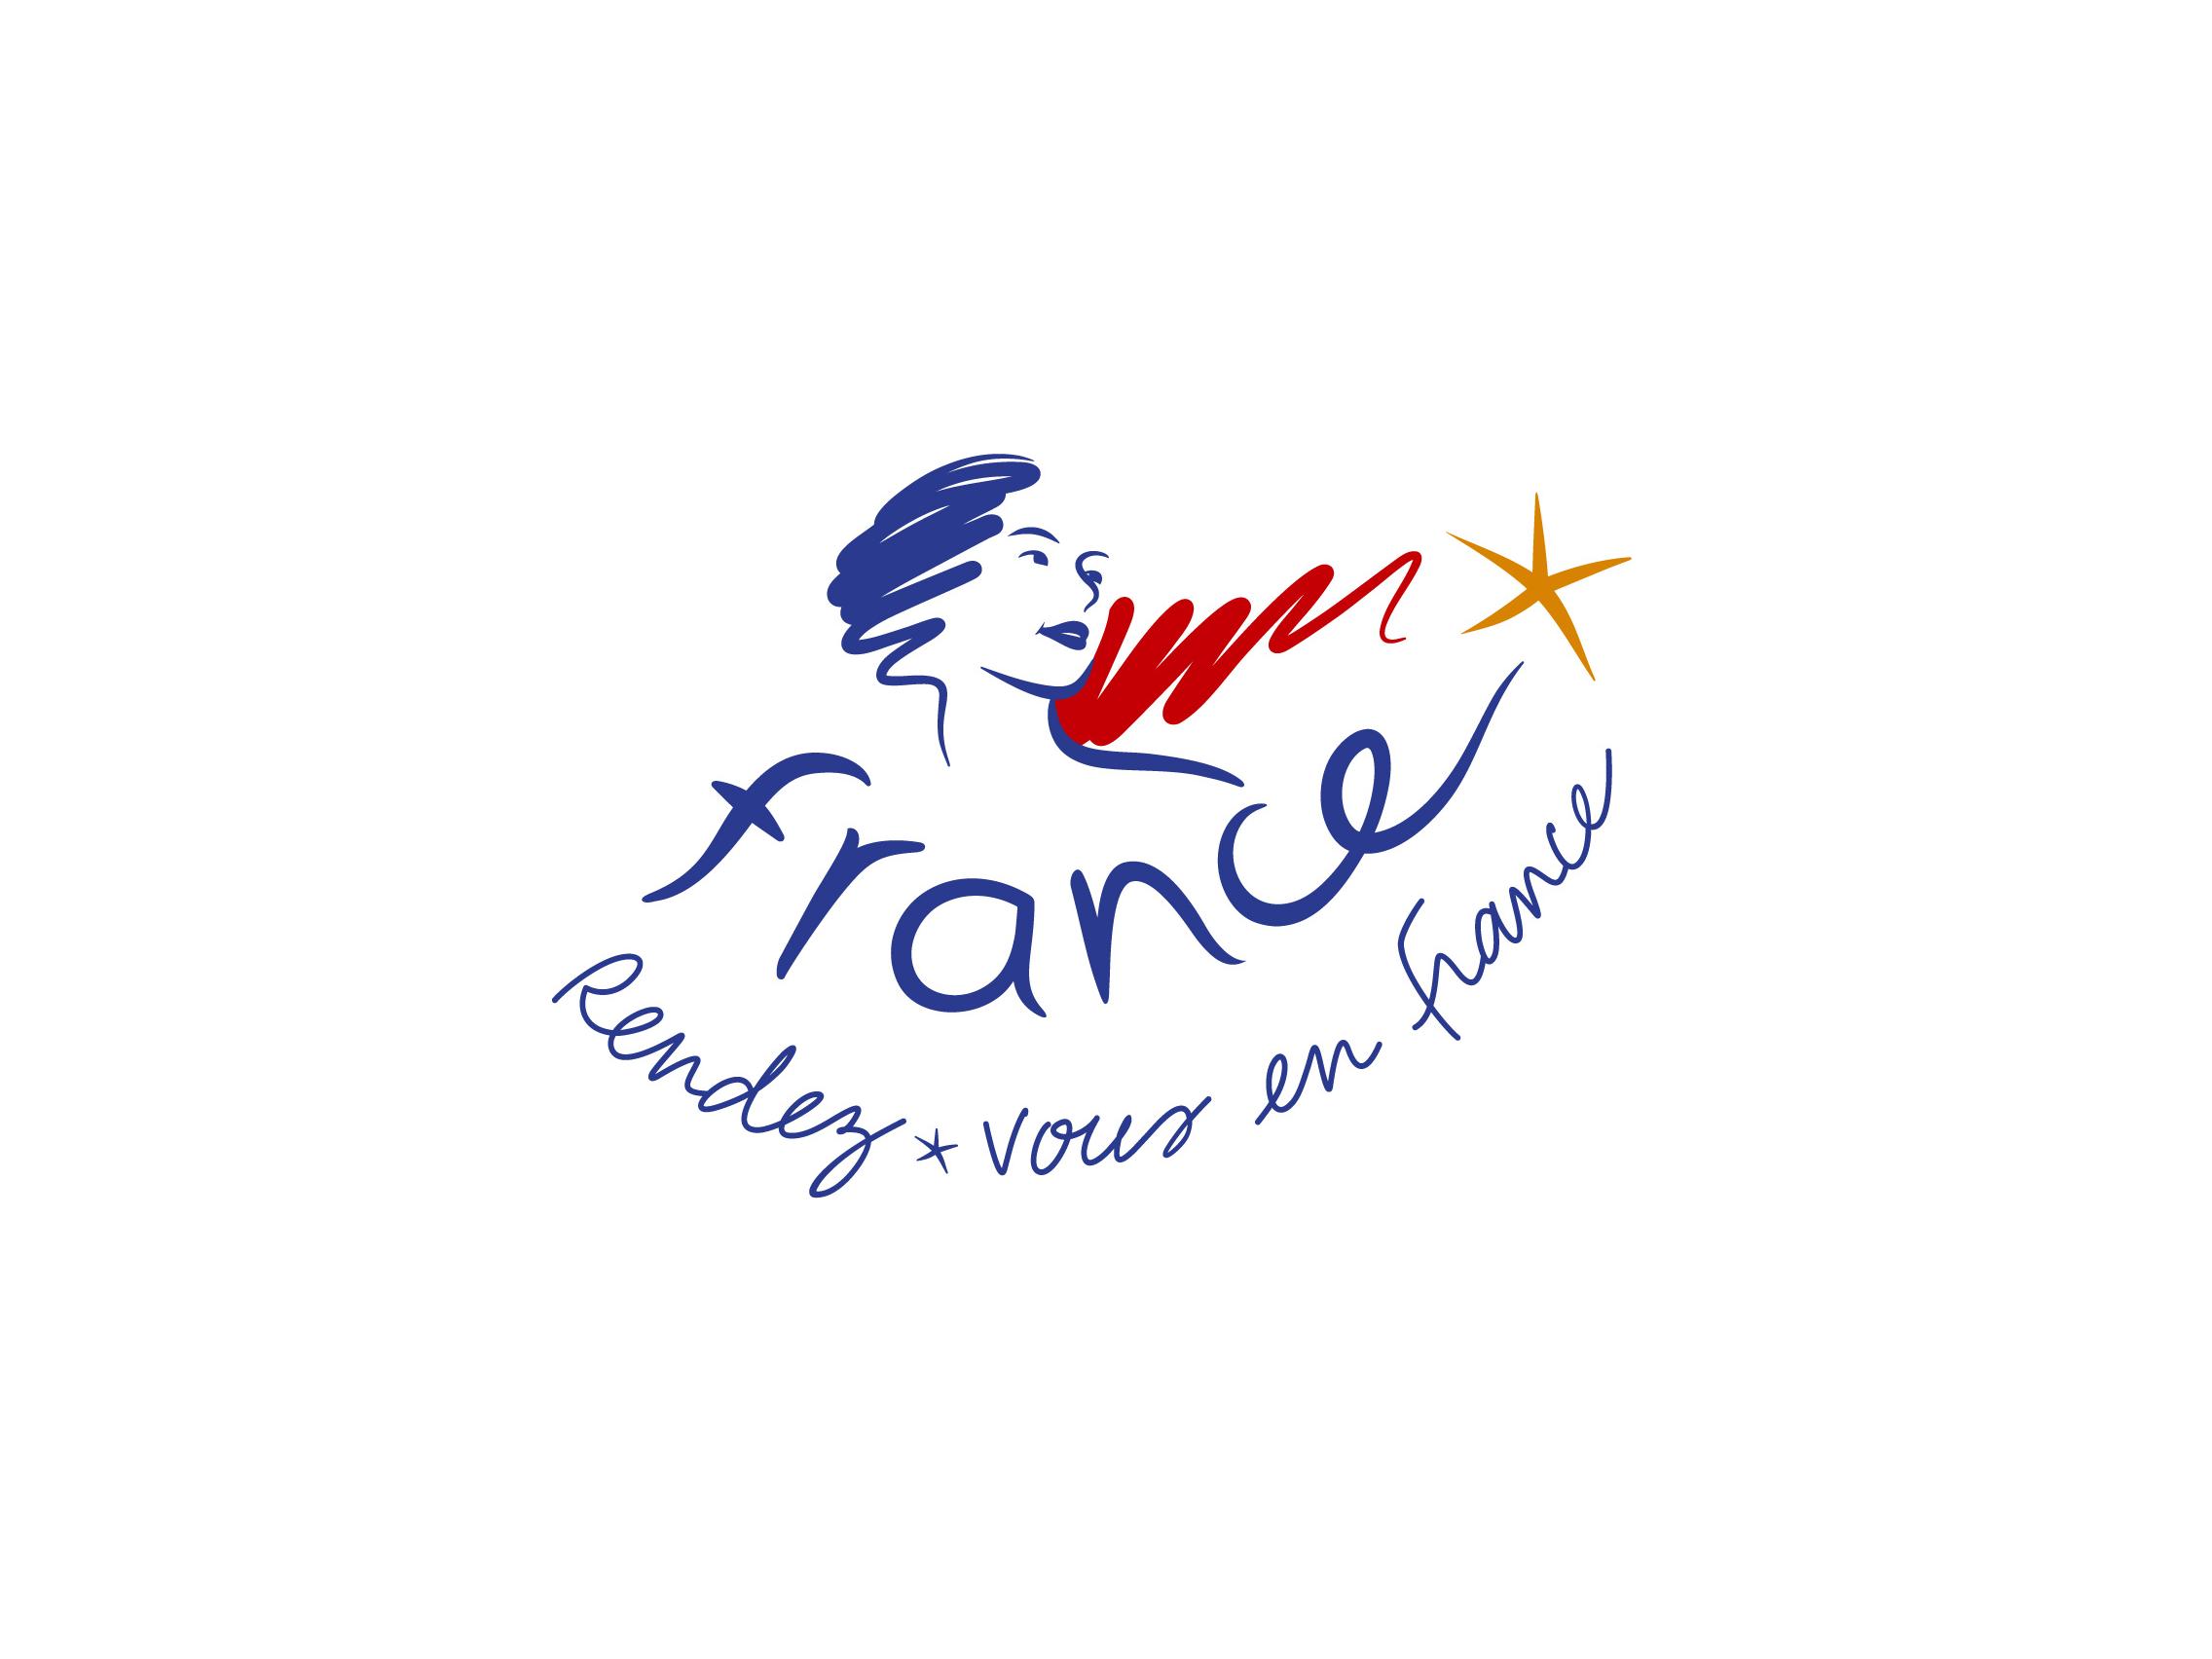 France clipart tourism france. How does our visit